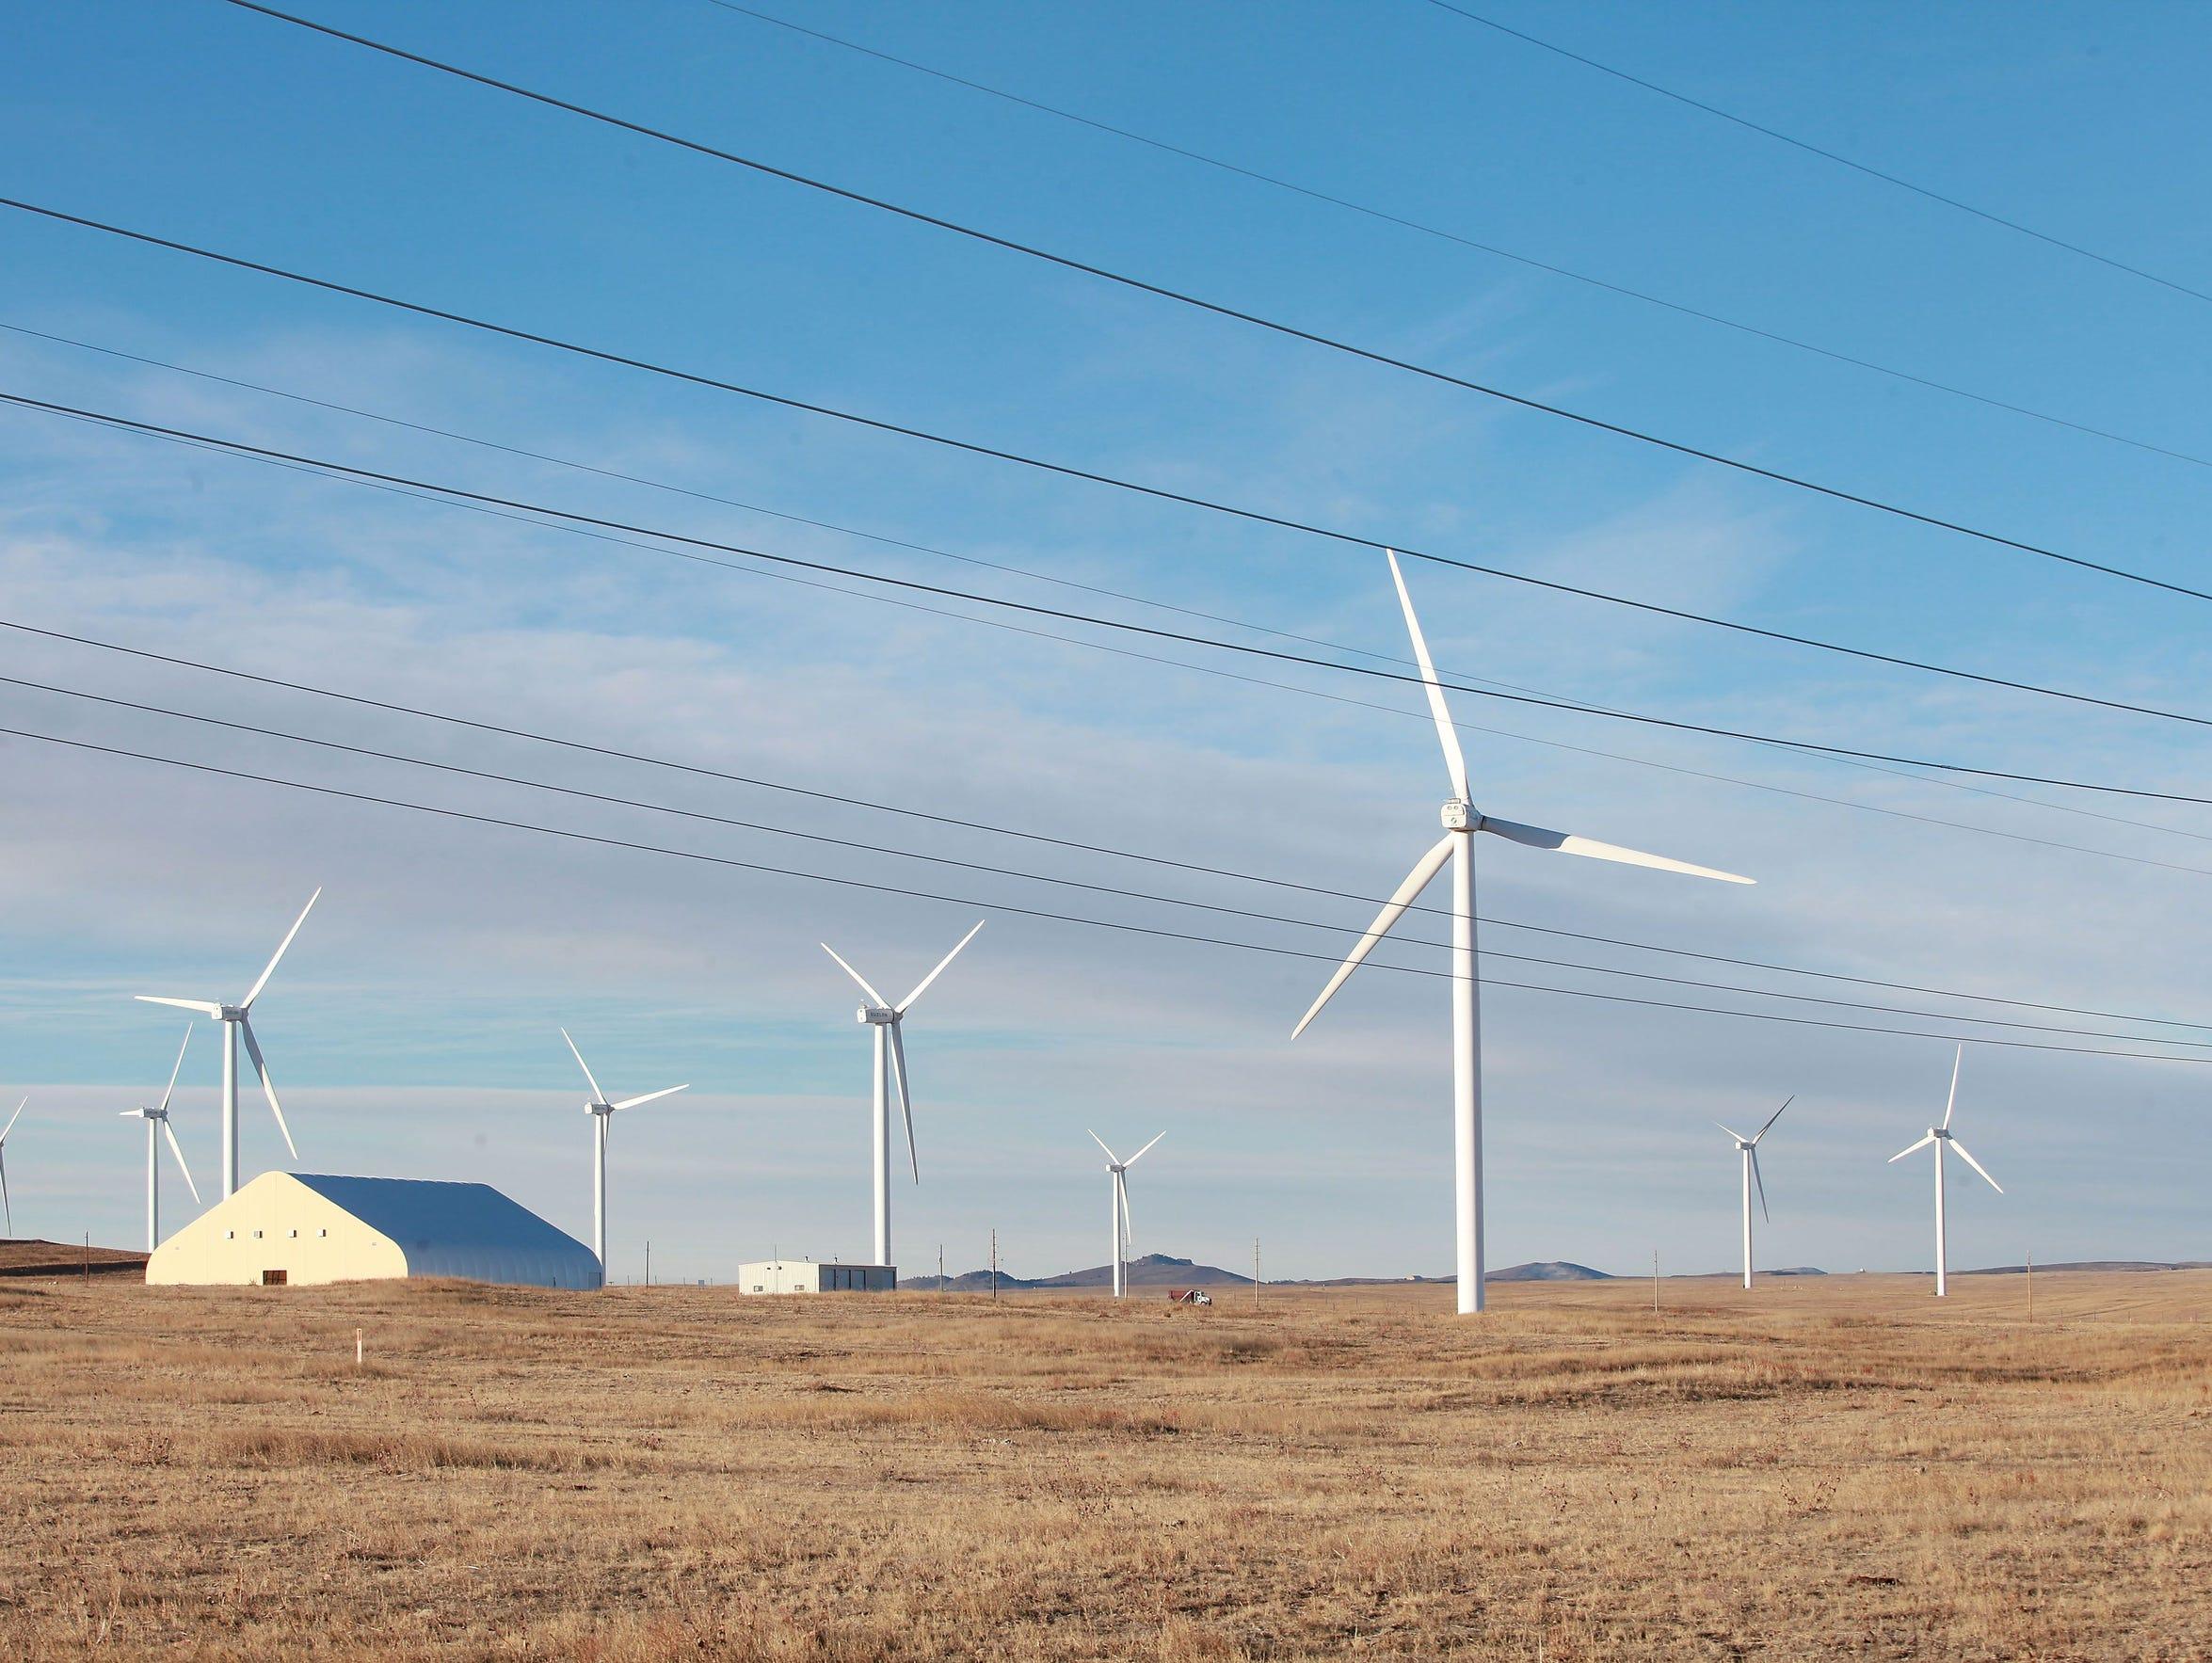 Duke Energy's Happy Jack wind farm near Cheyenne, Wyoming